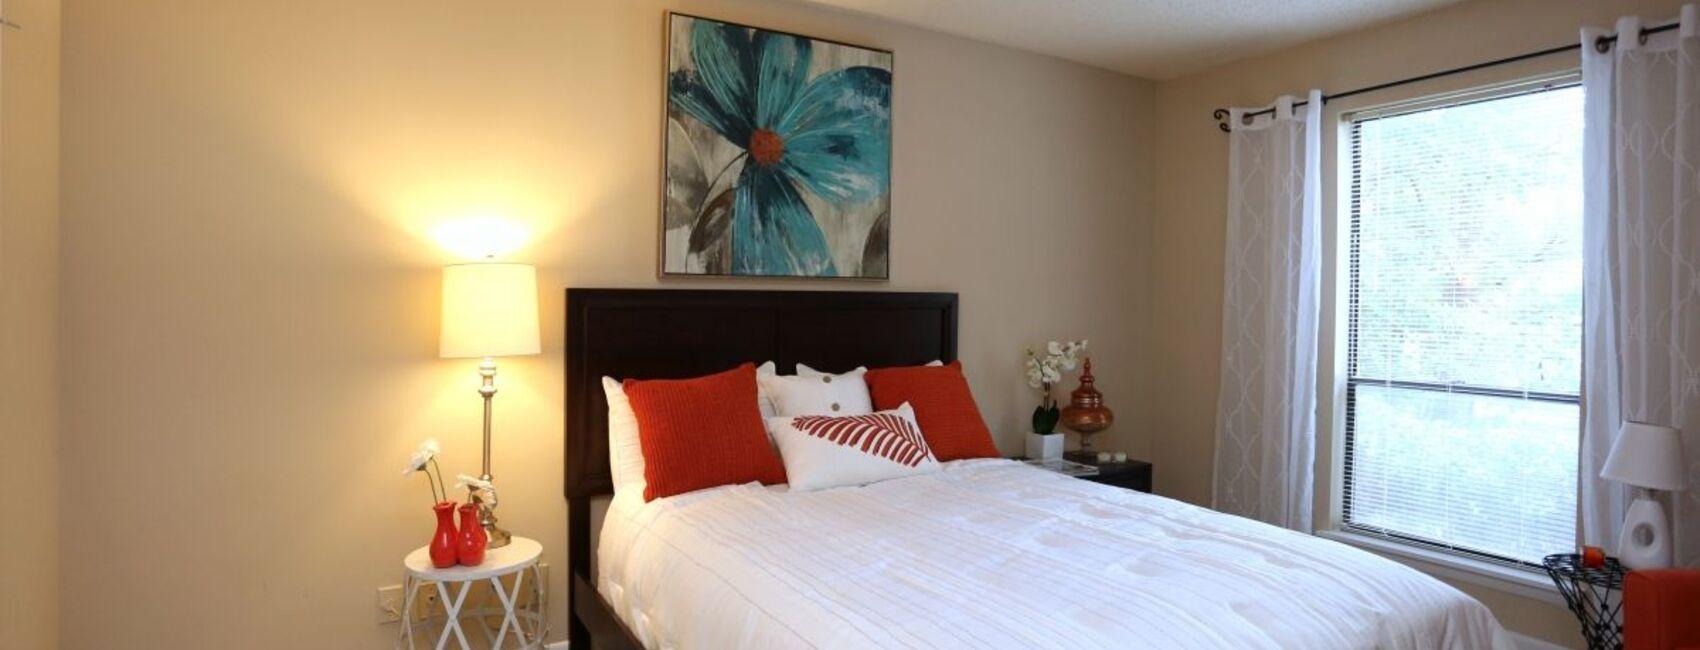 Apartments for Rent in Norcross, GA | Hampton Woods - Home